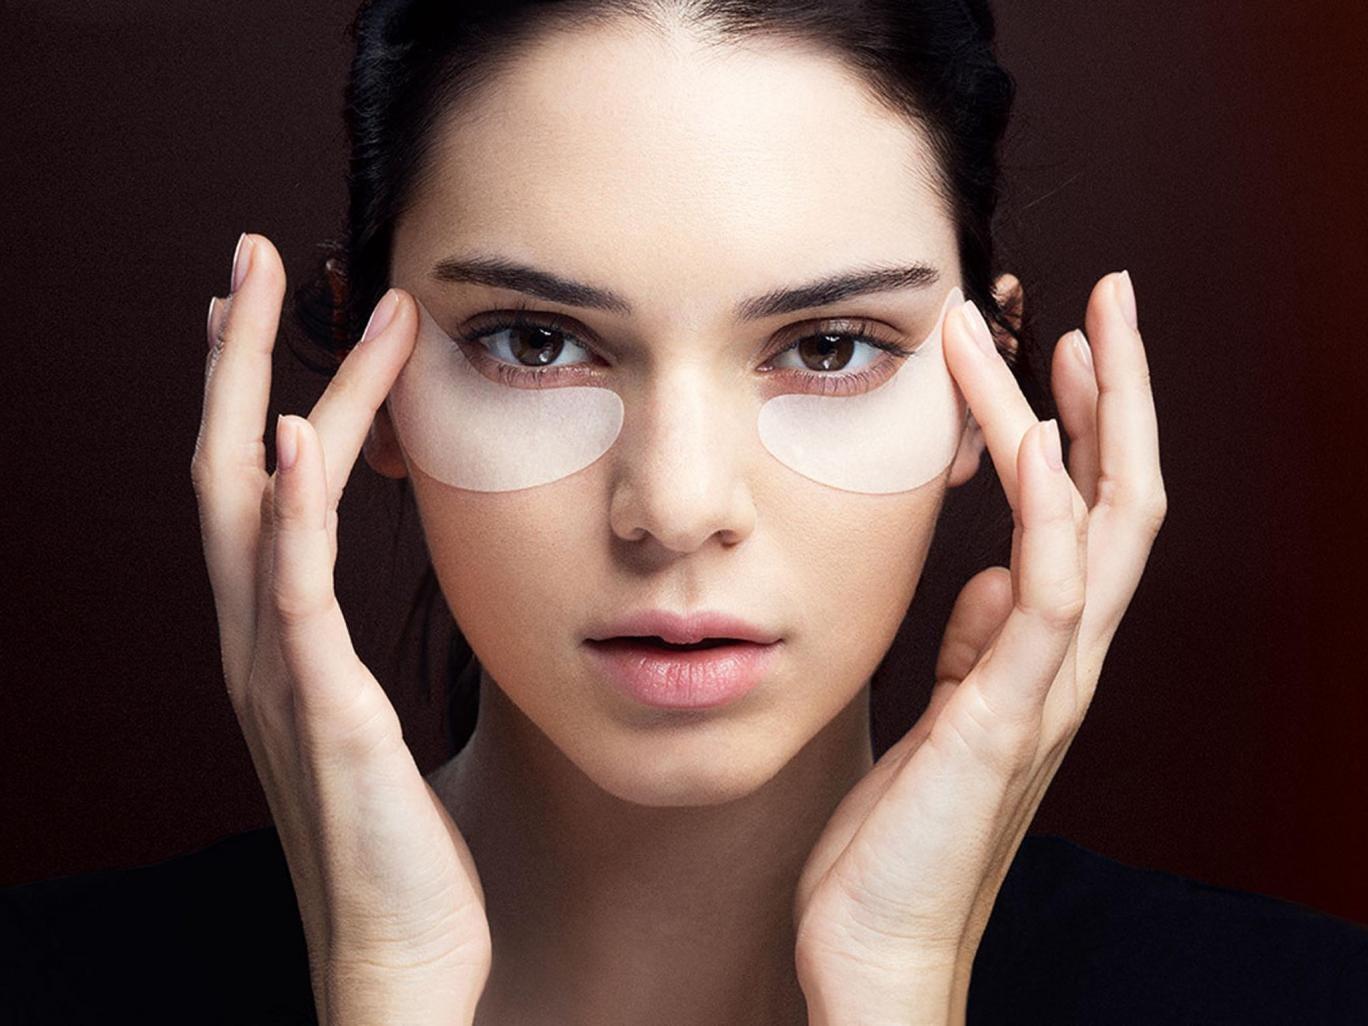 Rounding in the eyes. How women distinguish rich men from pontorezov